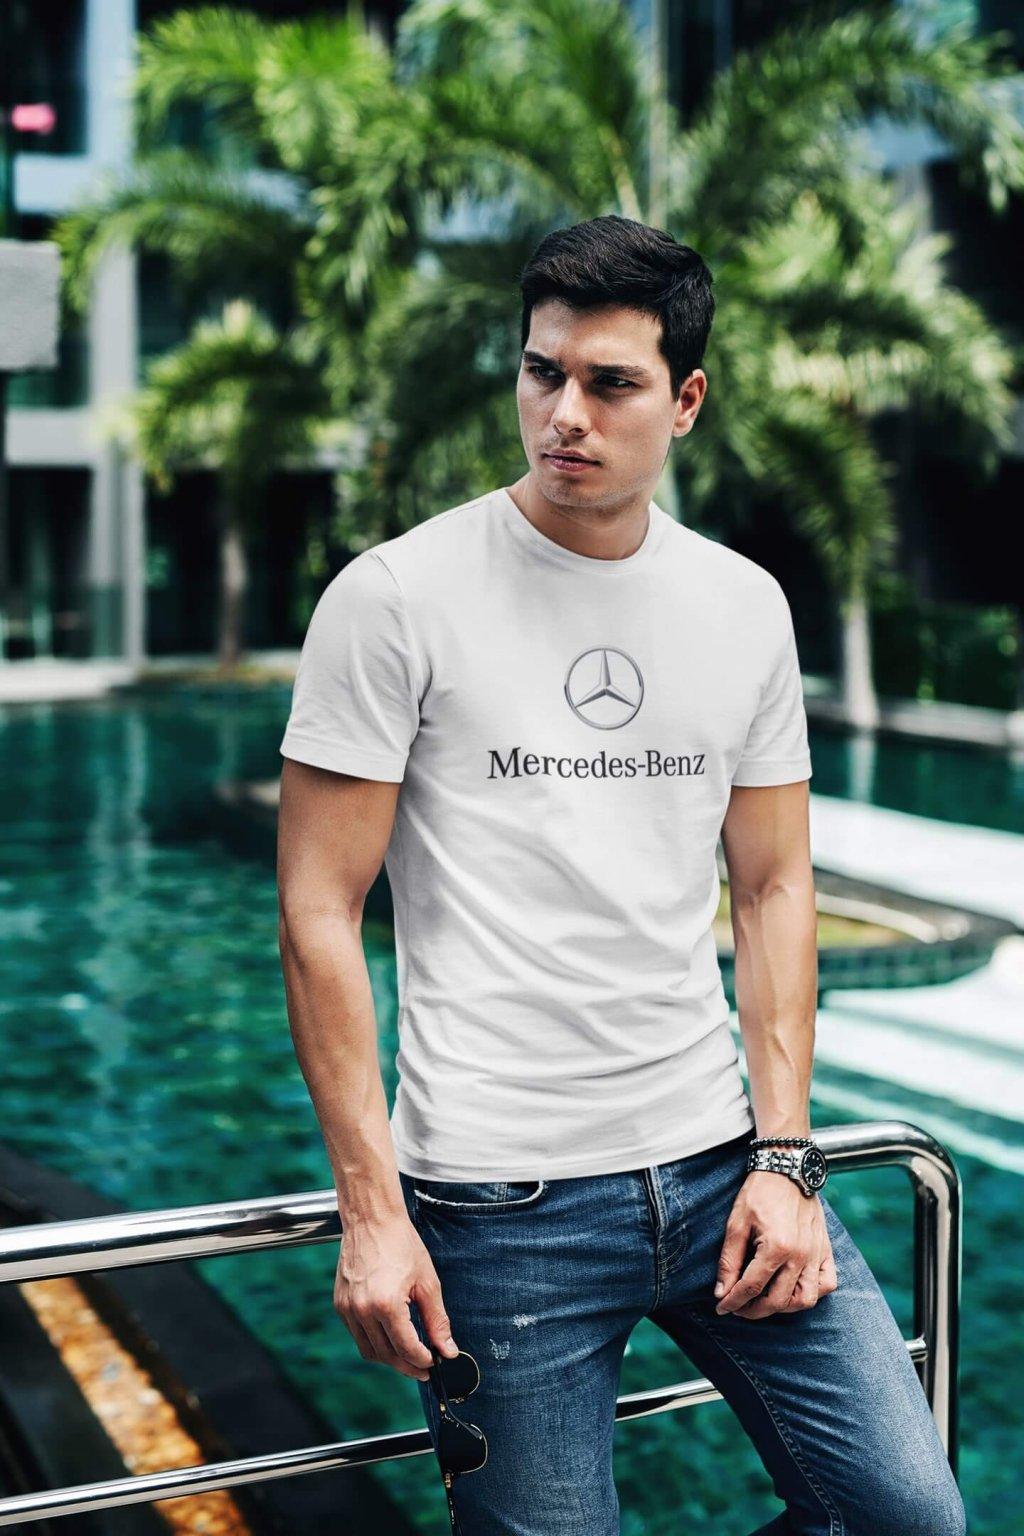 Tričko s logom auta Mercedes Benz